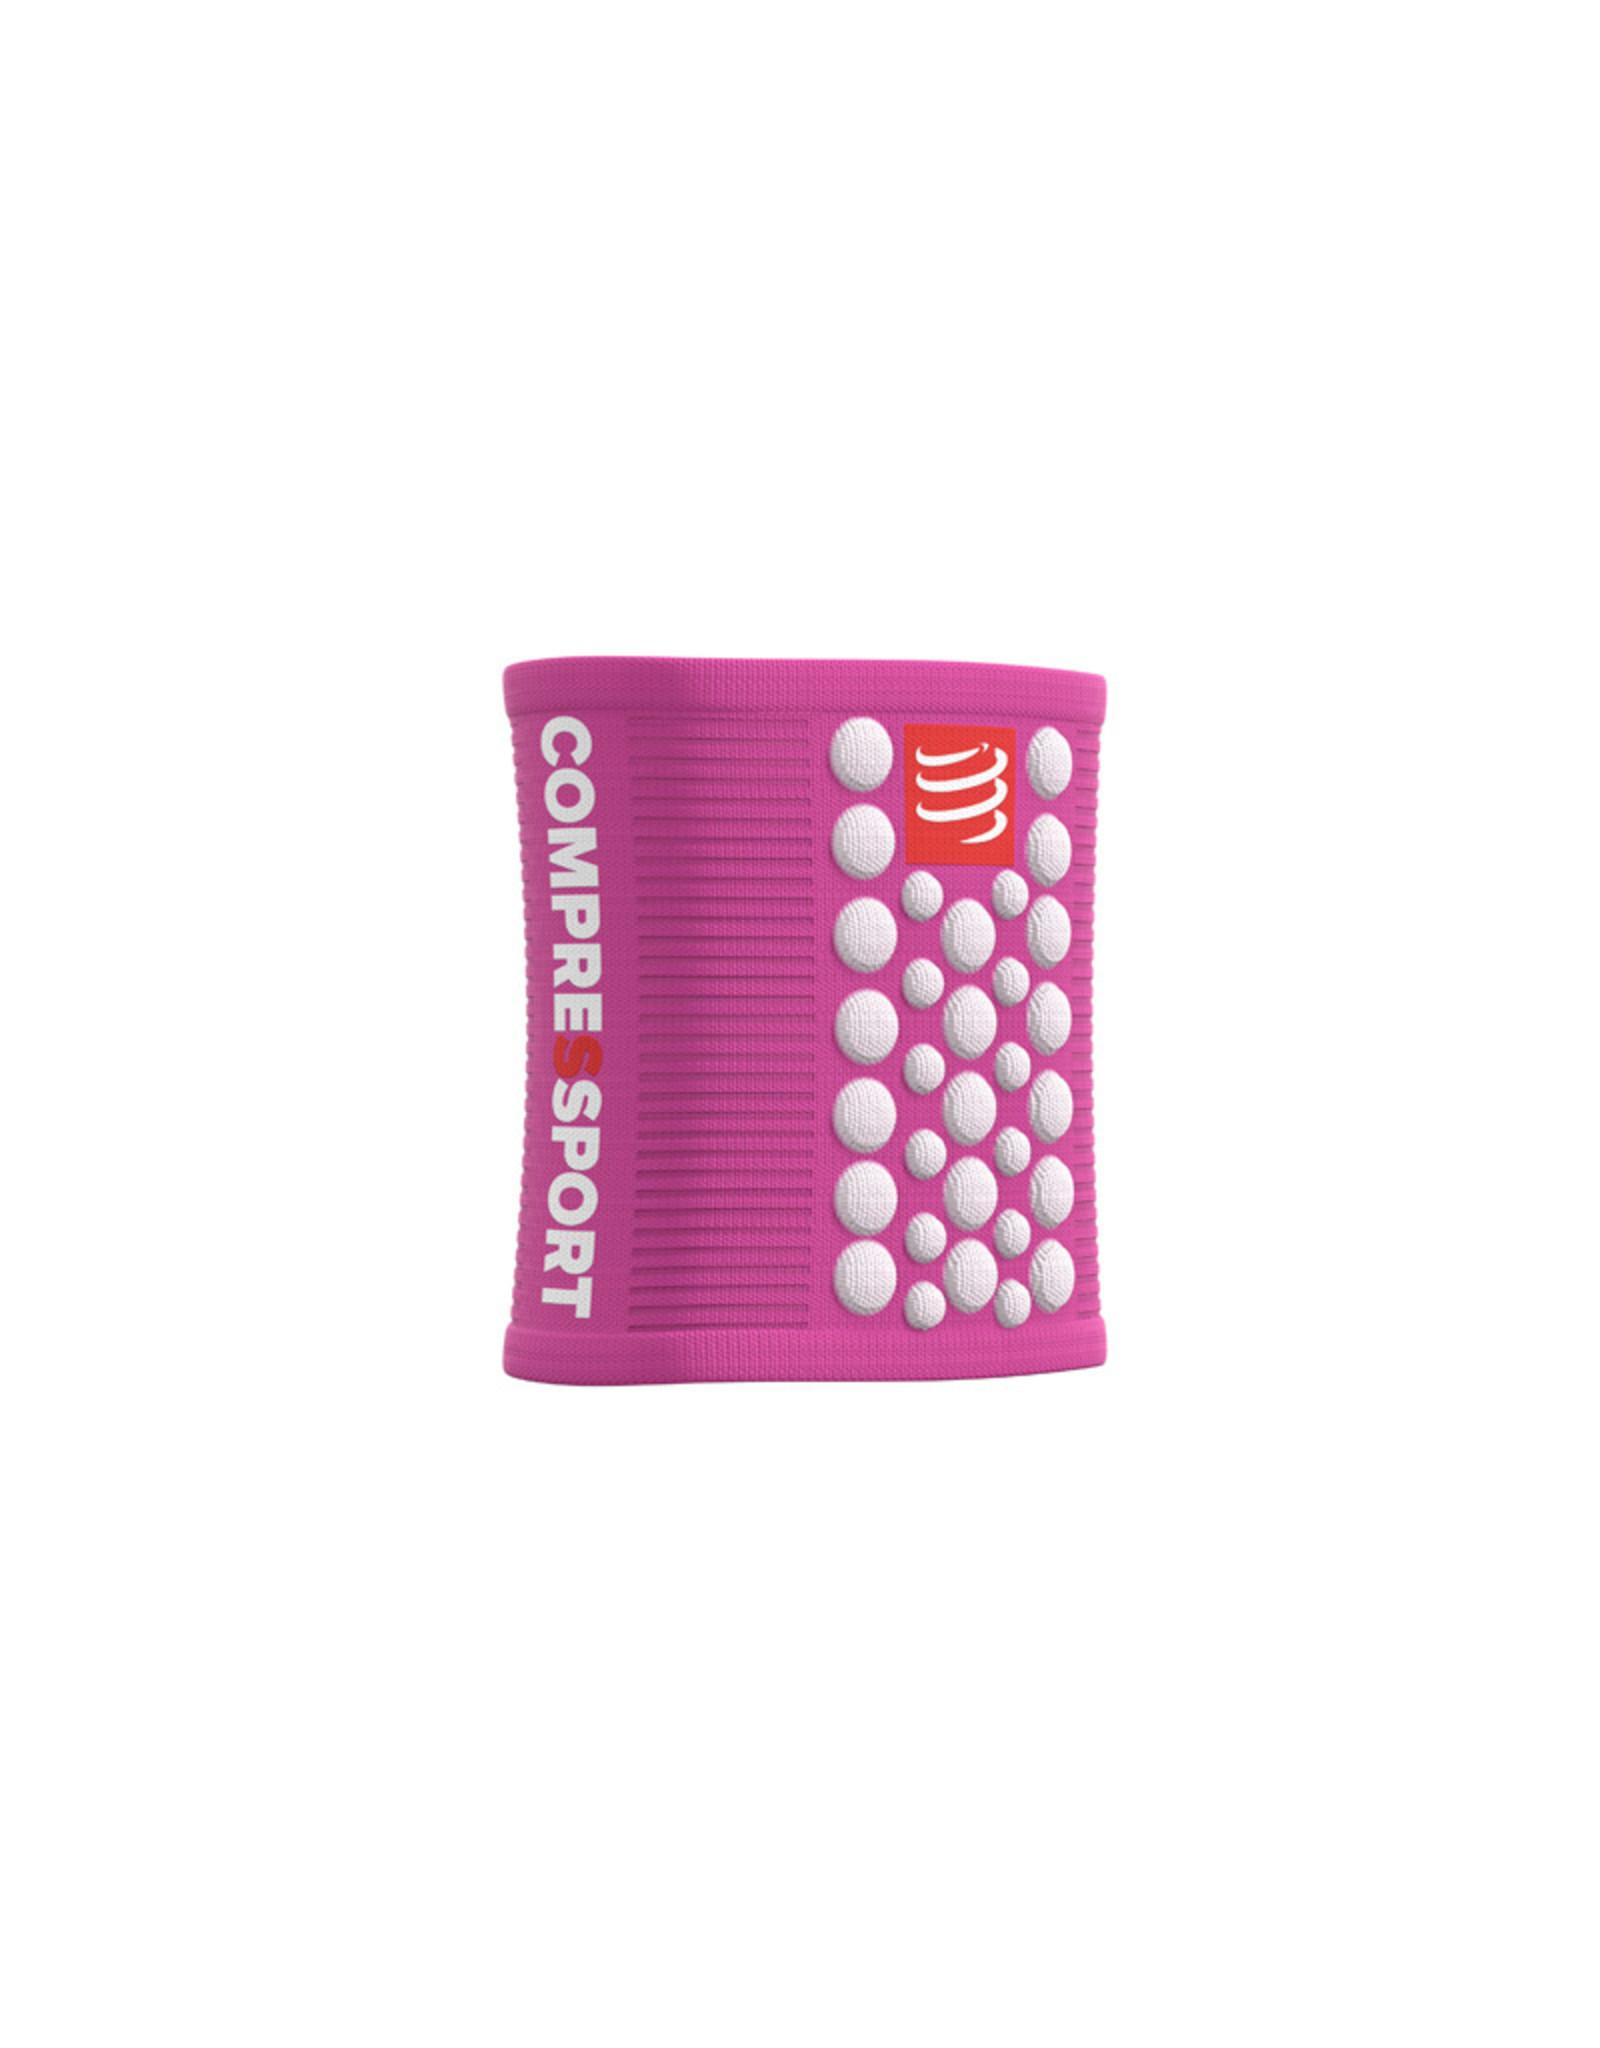 Compressport Zweetbandjes 3D Dots - Roze/Wit